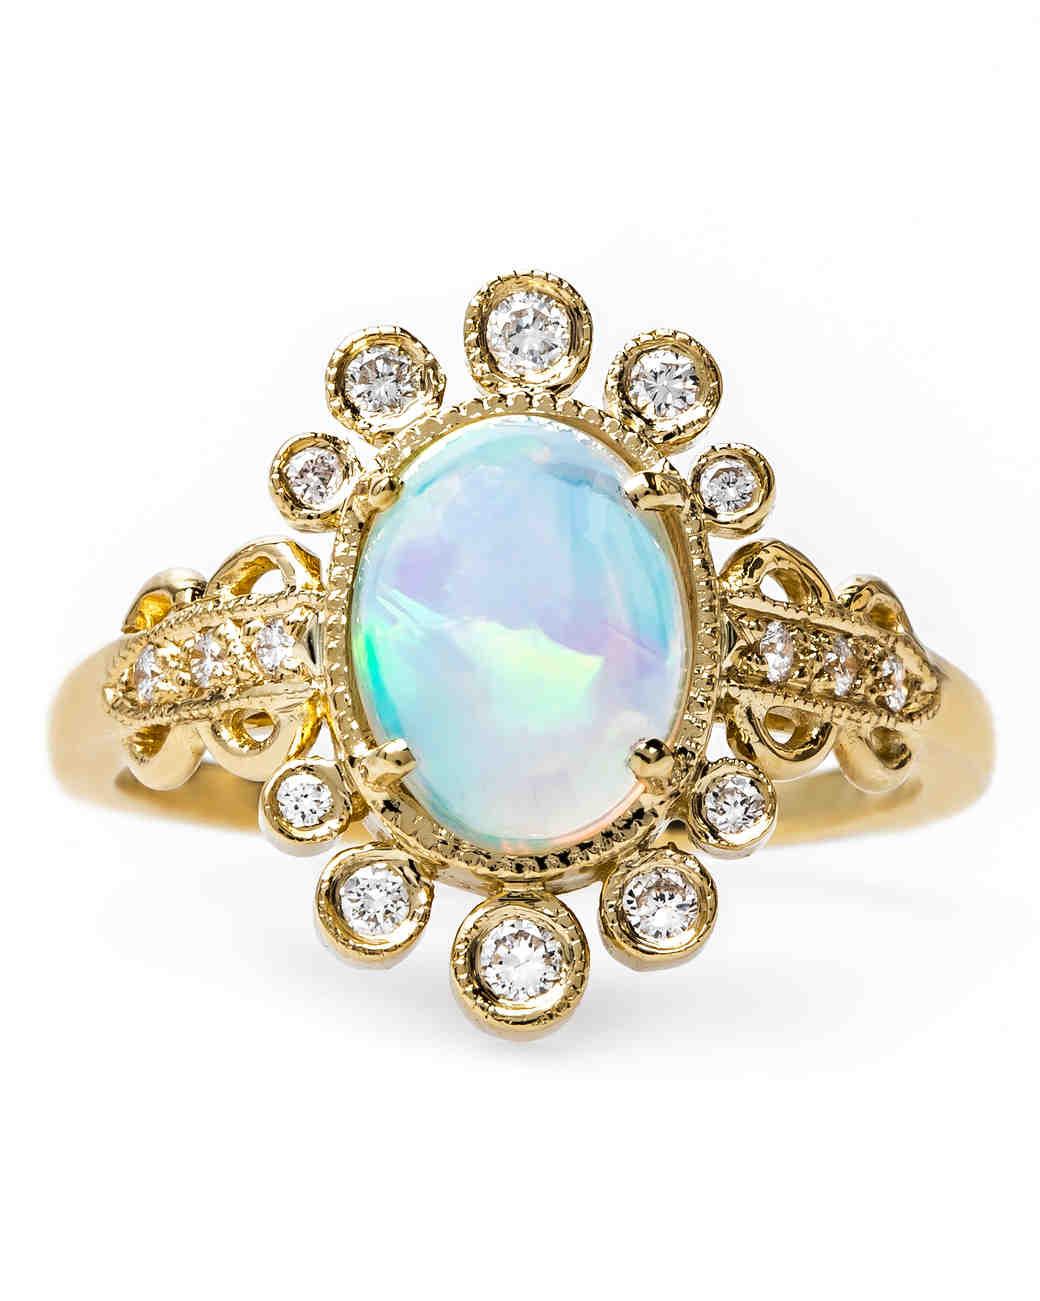 claire-pettibone-ring-collection-celestine-0915.jpg